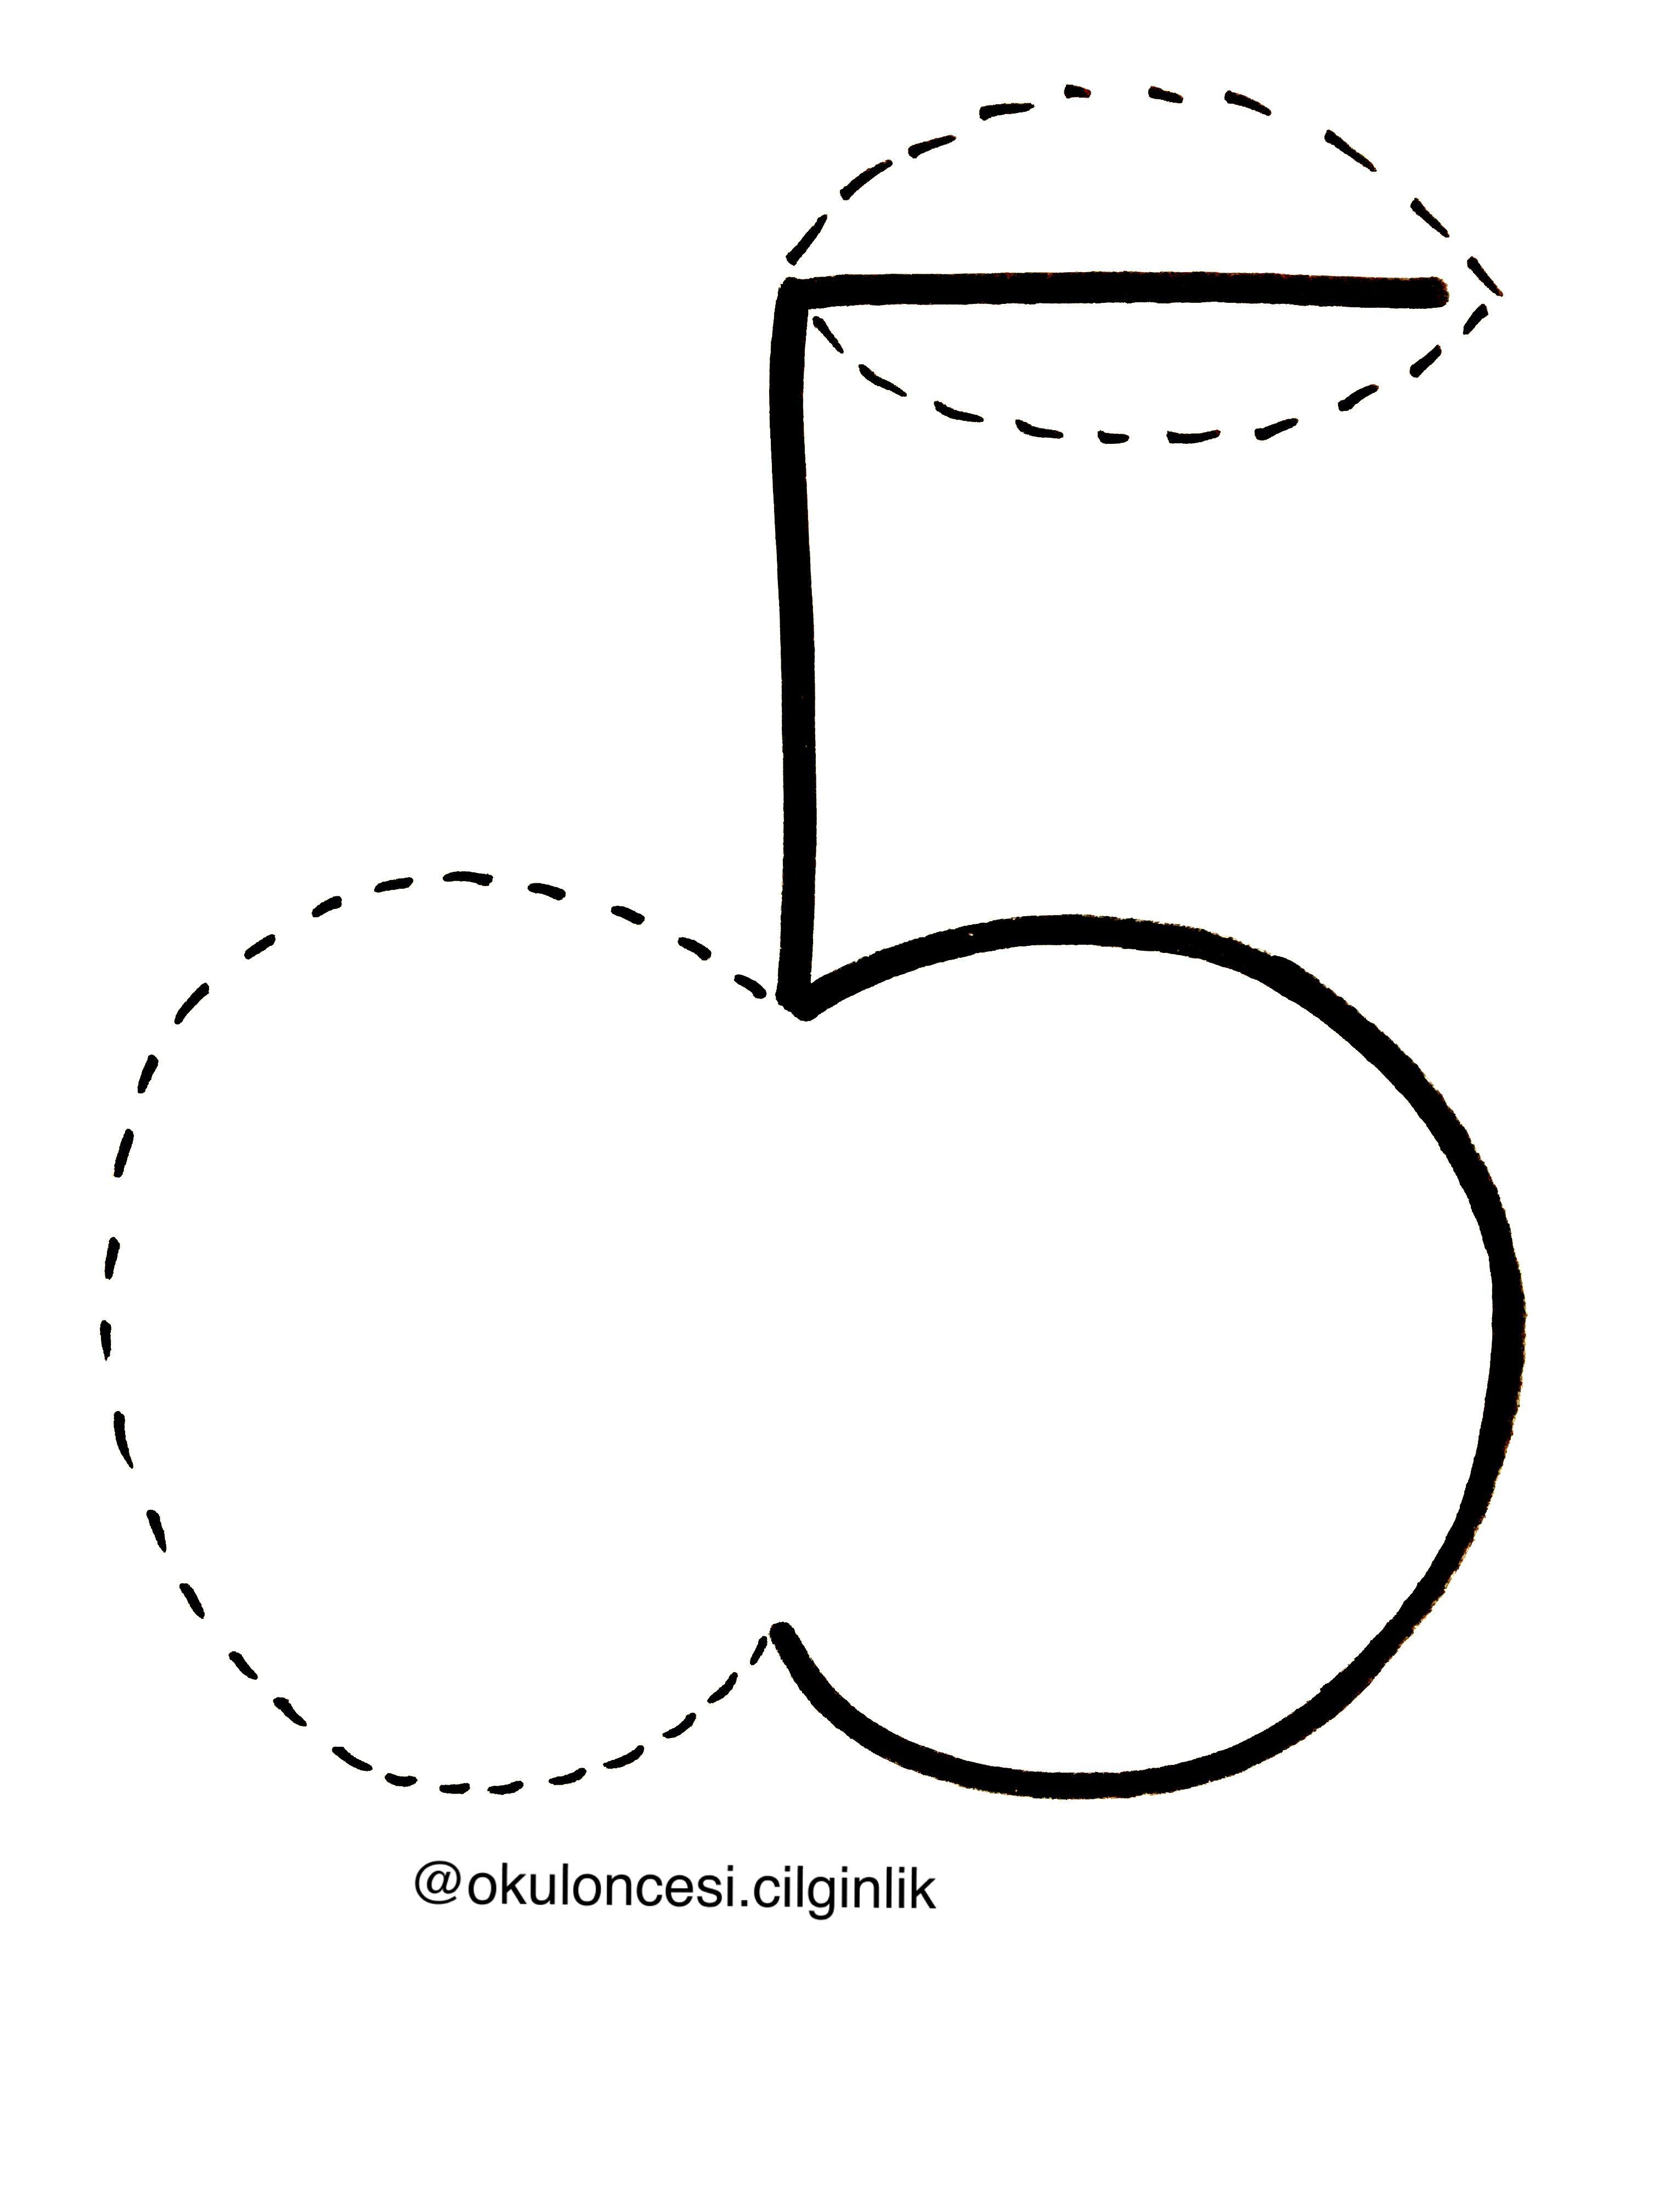 Bes Rakamindan Elma Basakogretmen Okuloncesicilginlik 5 5rakami Boyama Sayfalari Matematik Calisma Tablolari